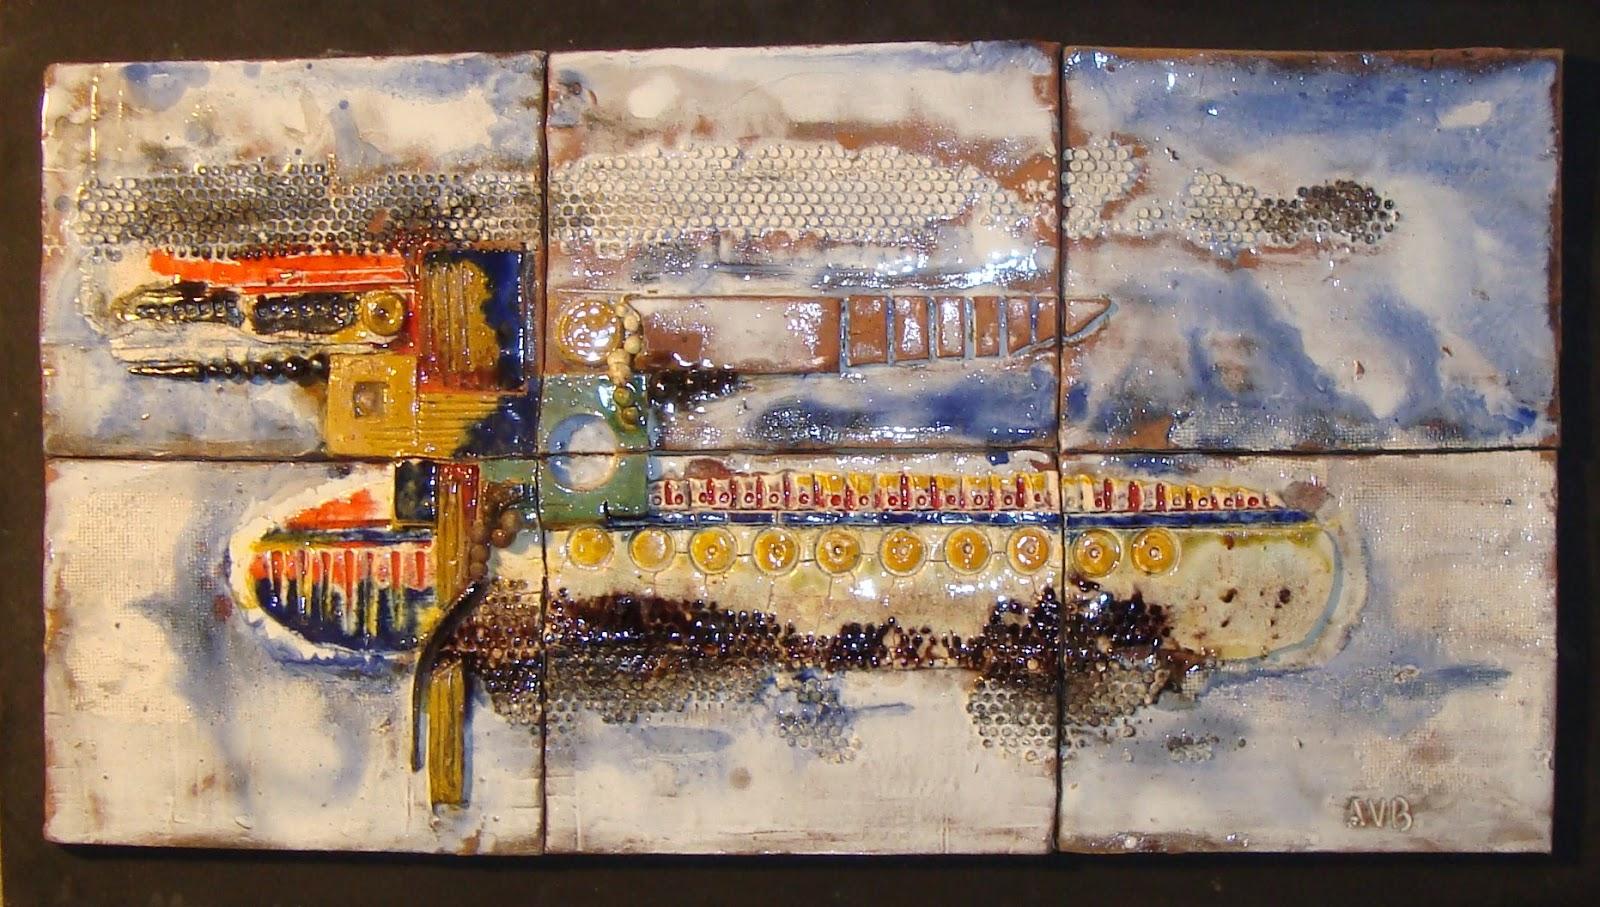 Ceramica artistica villanueva murales esmaltados en ceramica - Murales de ceramica artistica ...